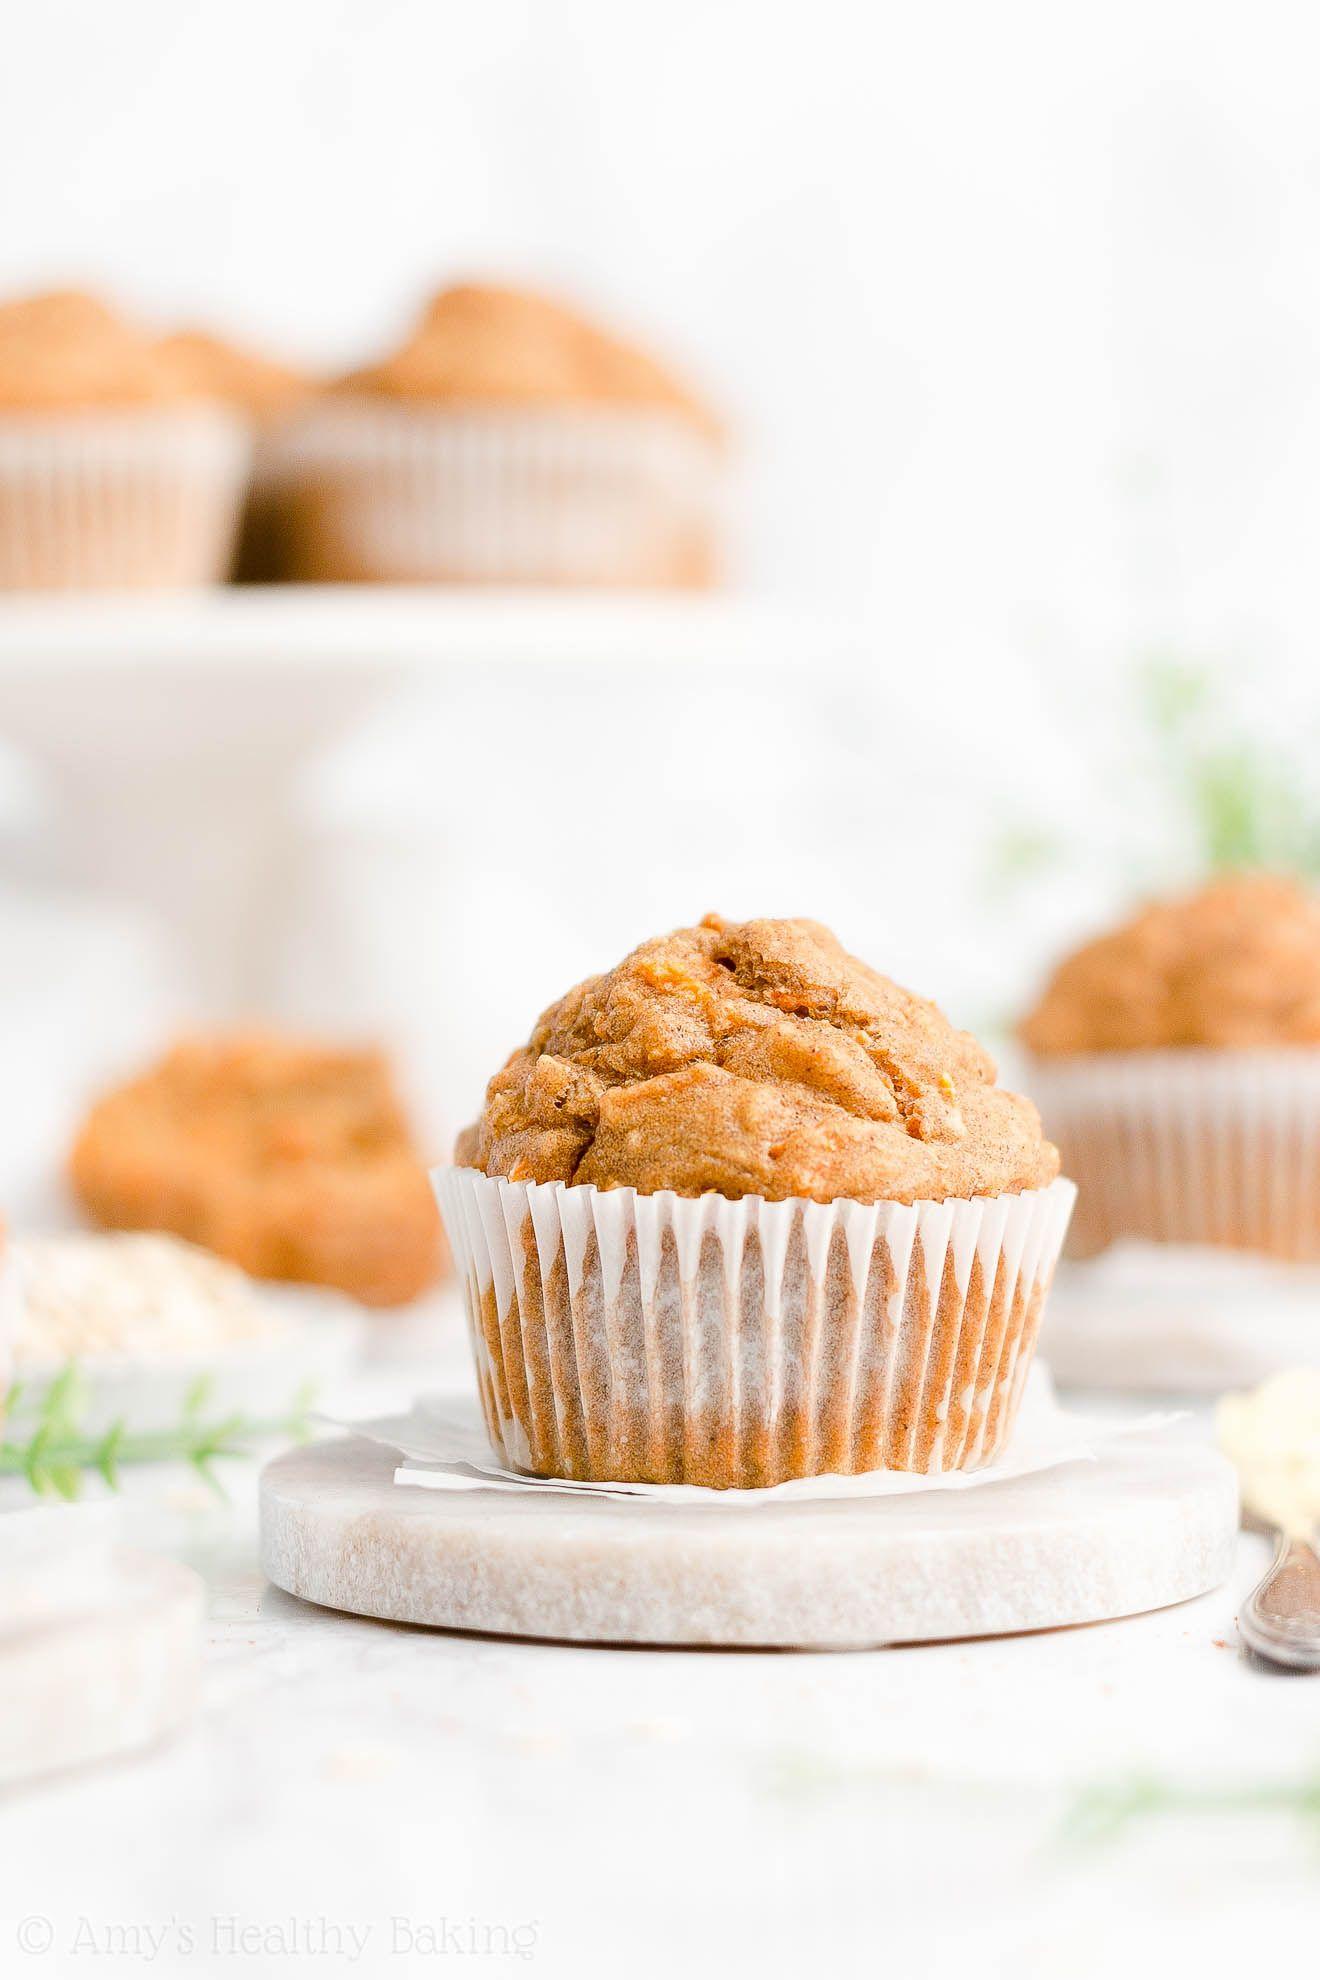 Healthy carrot cake oatmeal muffins so moist fluffy